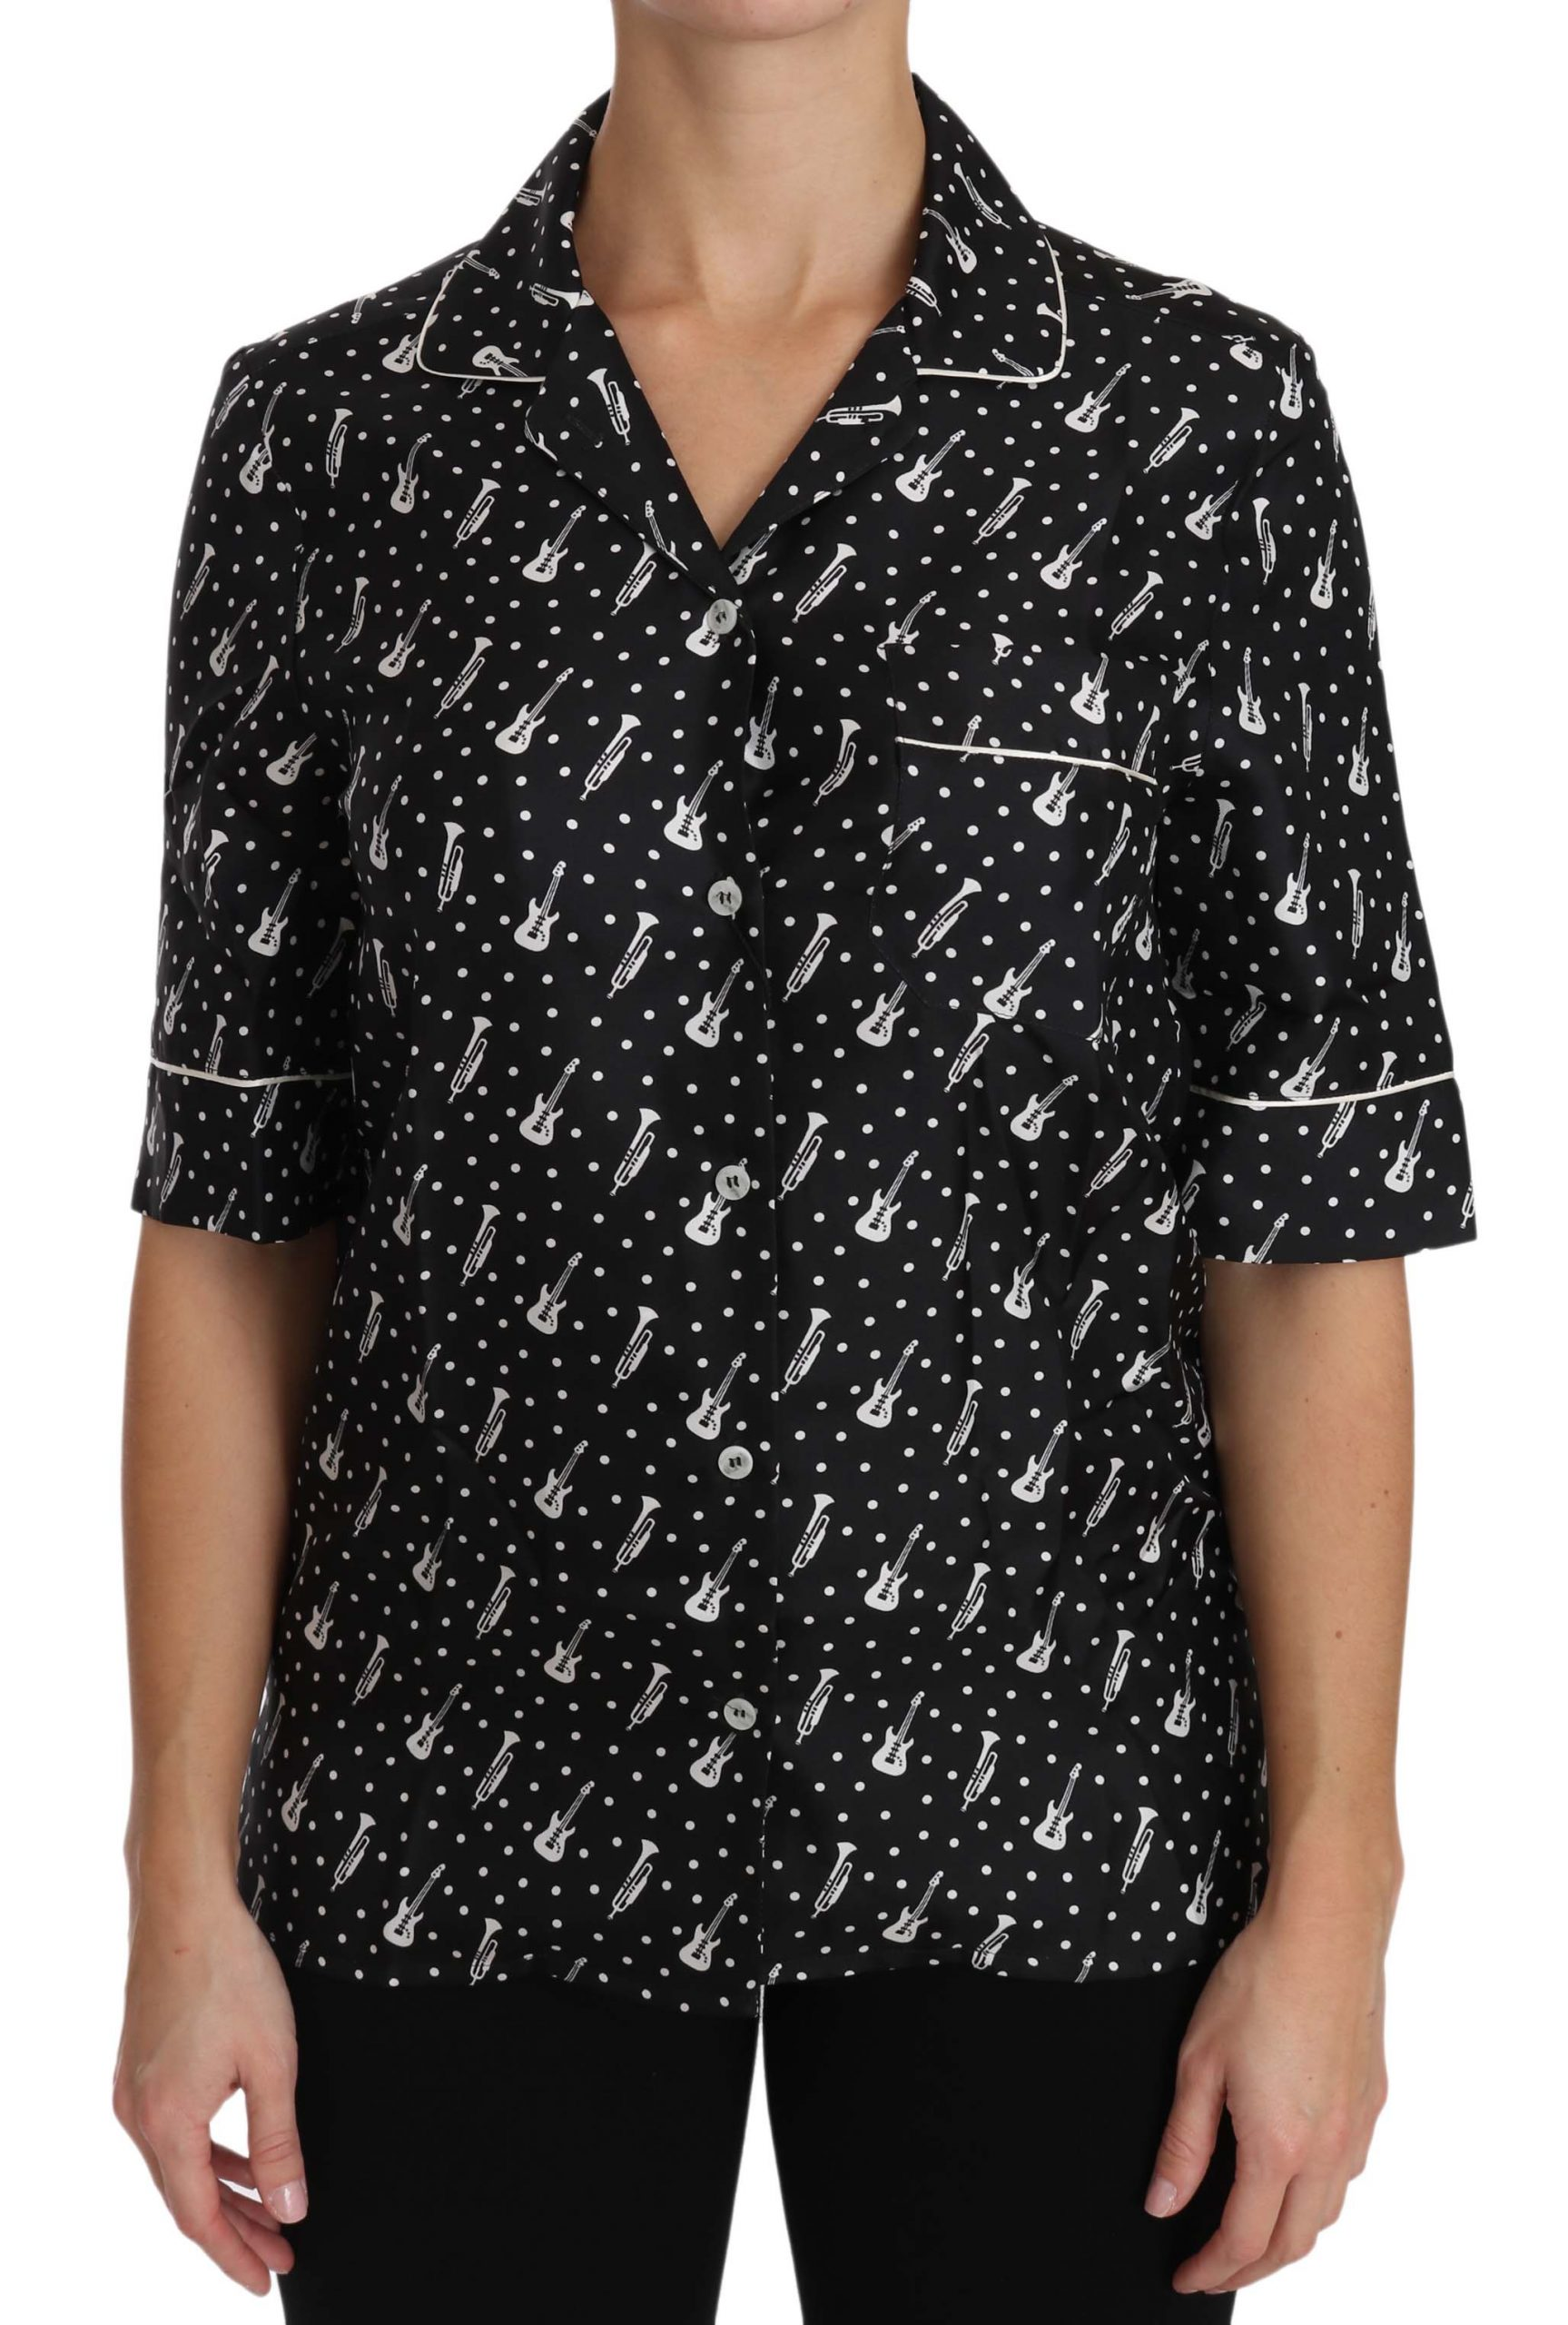 Dolce & Gabbana Women's Guitar & Trumpet Print Silk Shirt Black TSH3181 - IT42|M